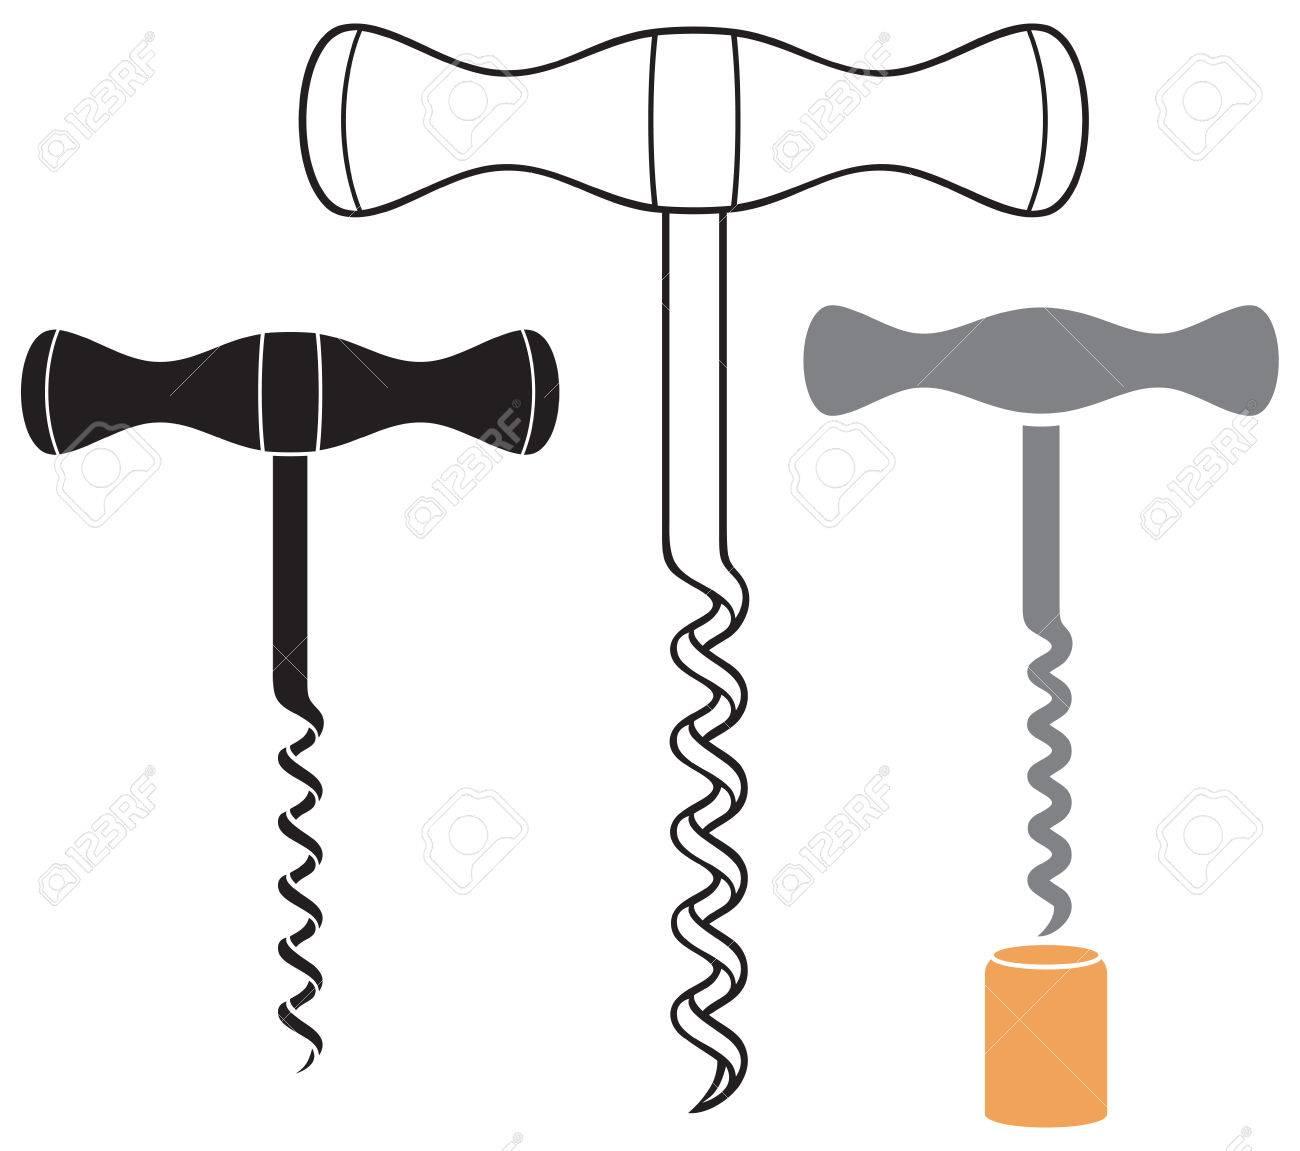 hight resolution of corkscrew wine opener vector illustration stock vector 66527103